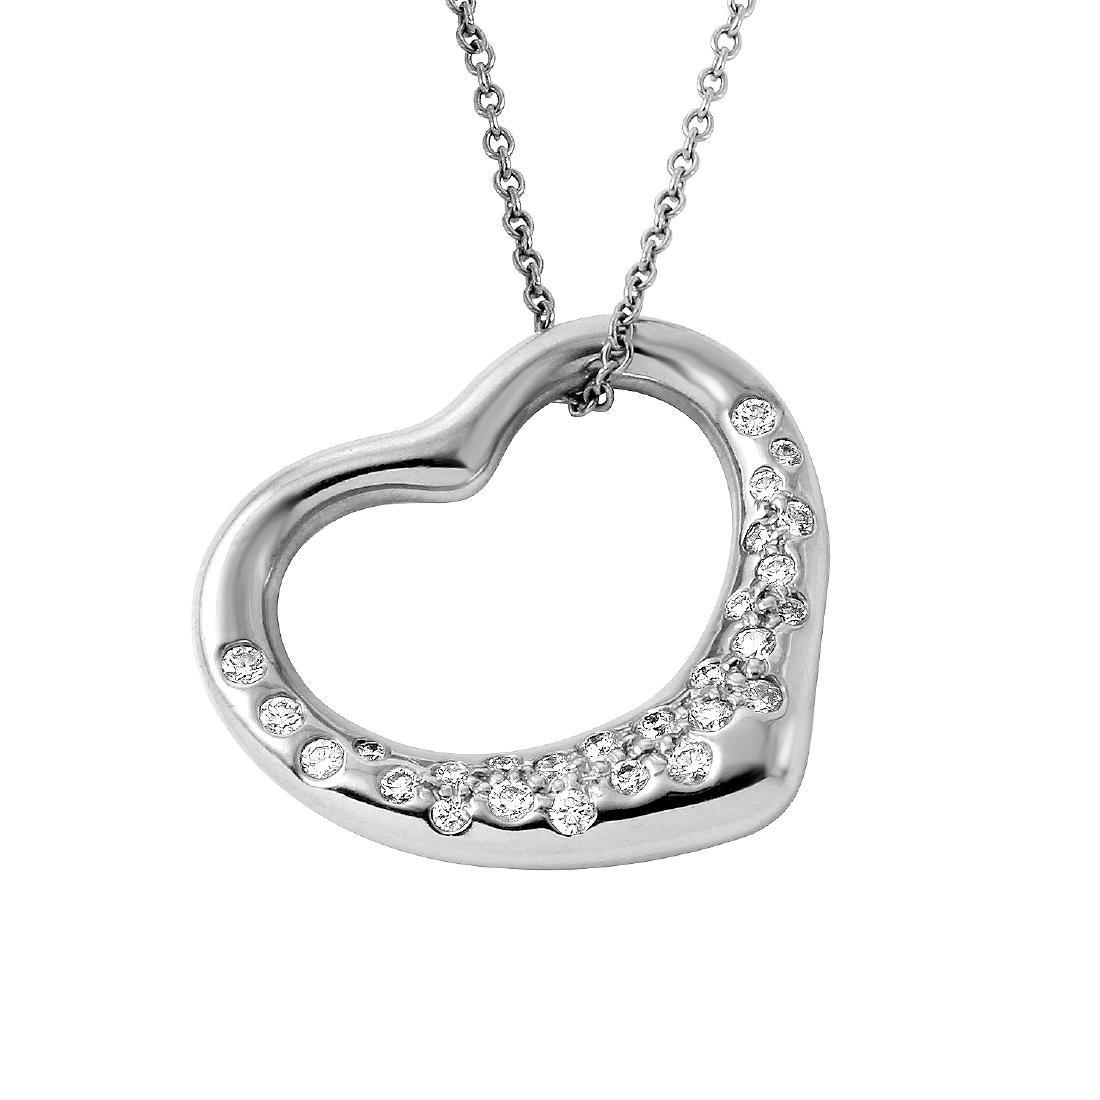 Tiffany & Co. Elsa Peretti Platinum Necklace - 2